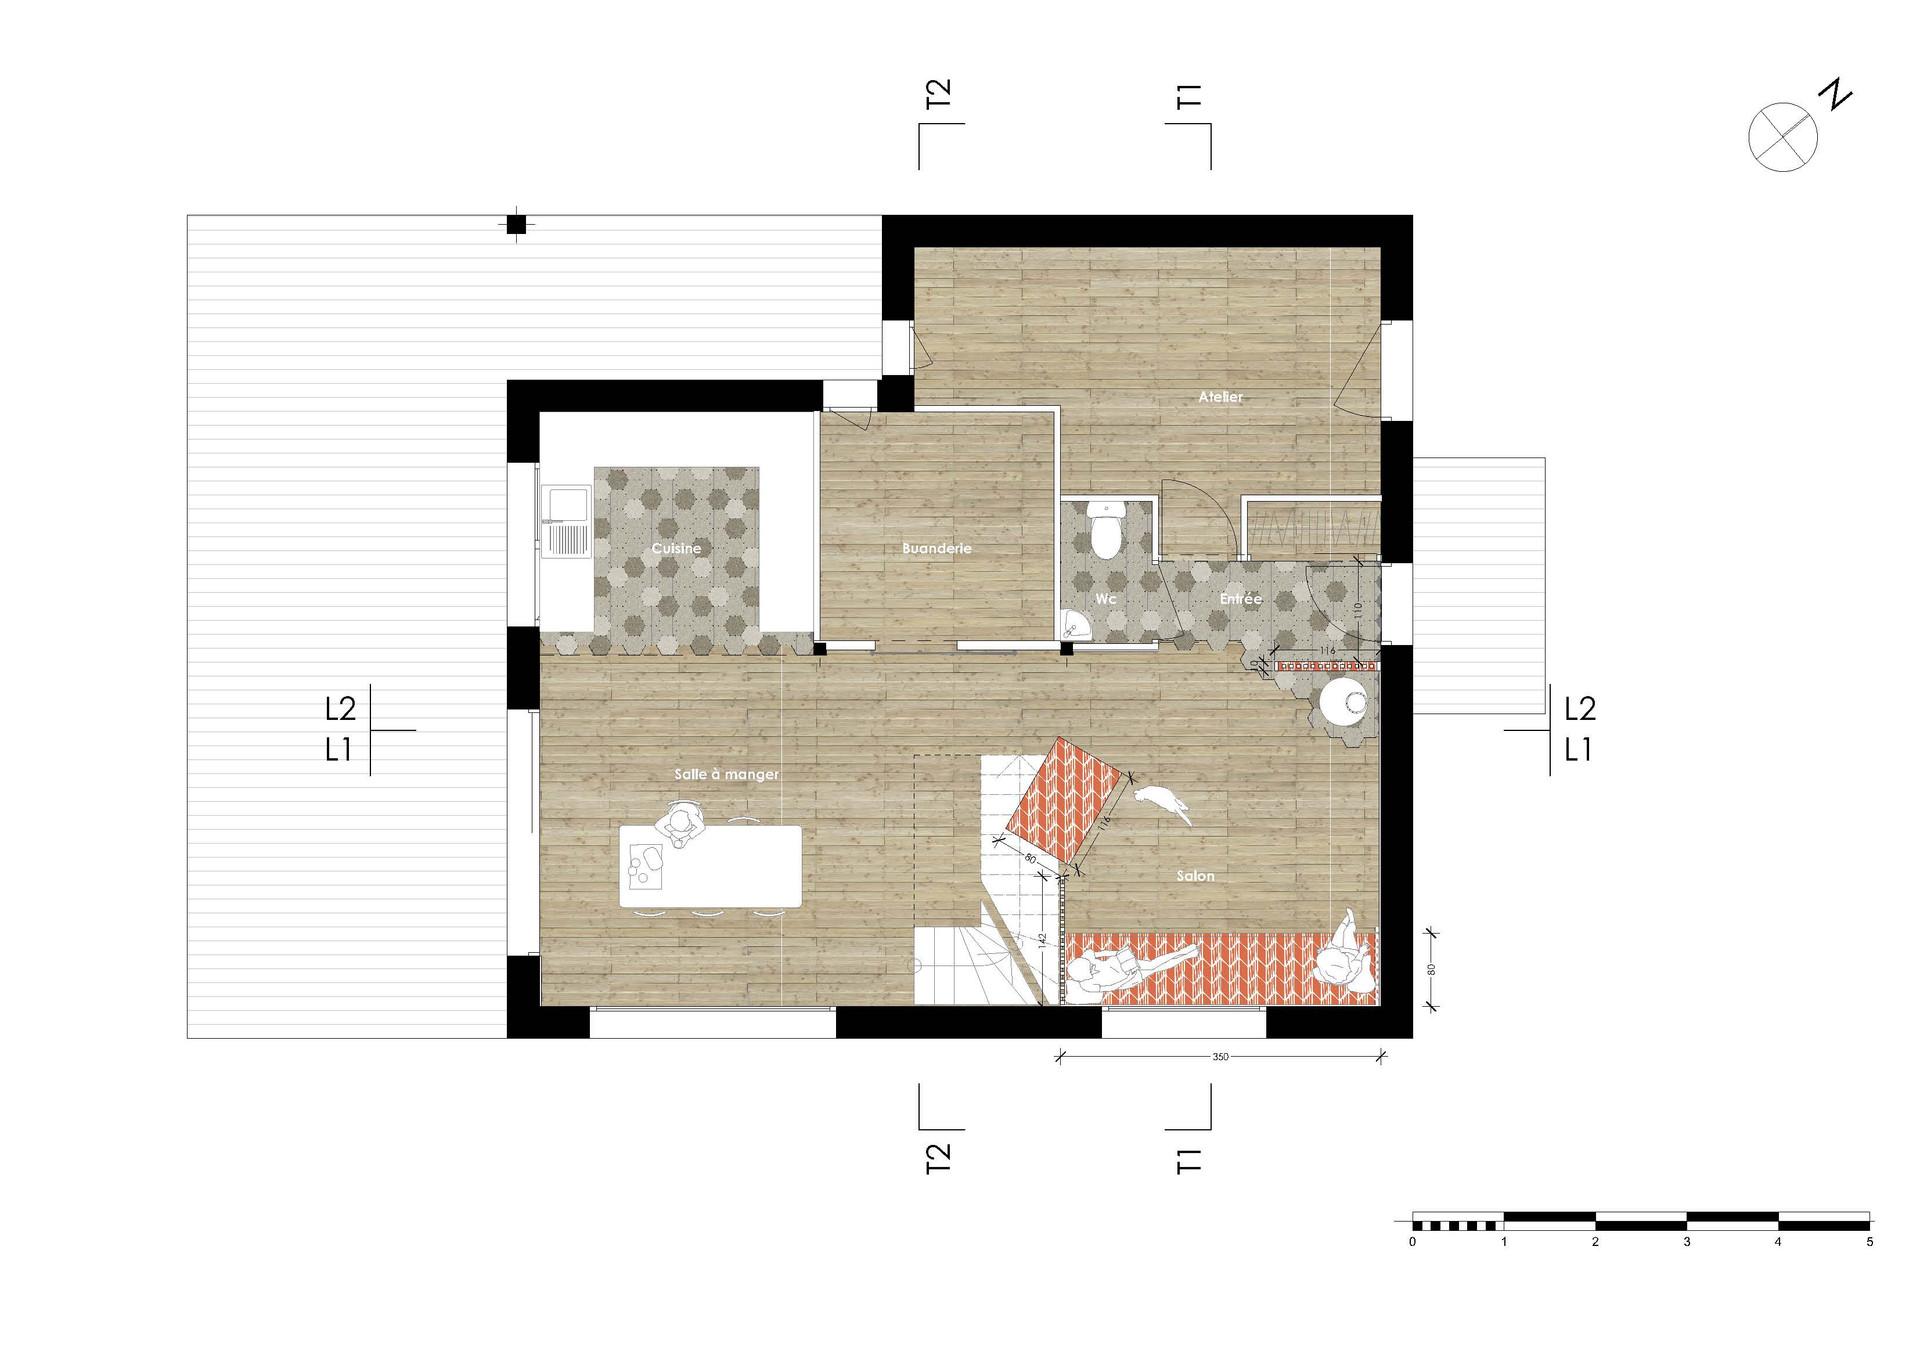 Hirundo-Architecture_Projet B&R_Plan RDC